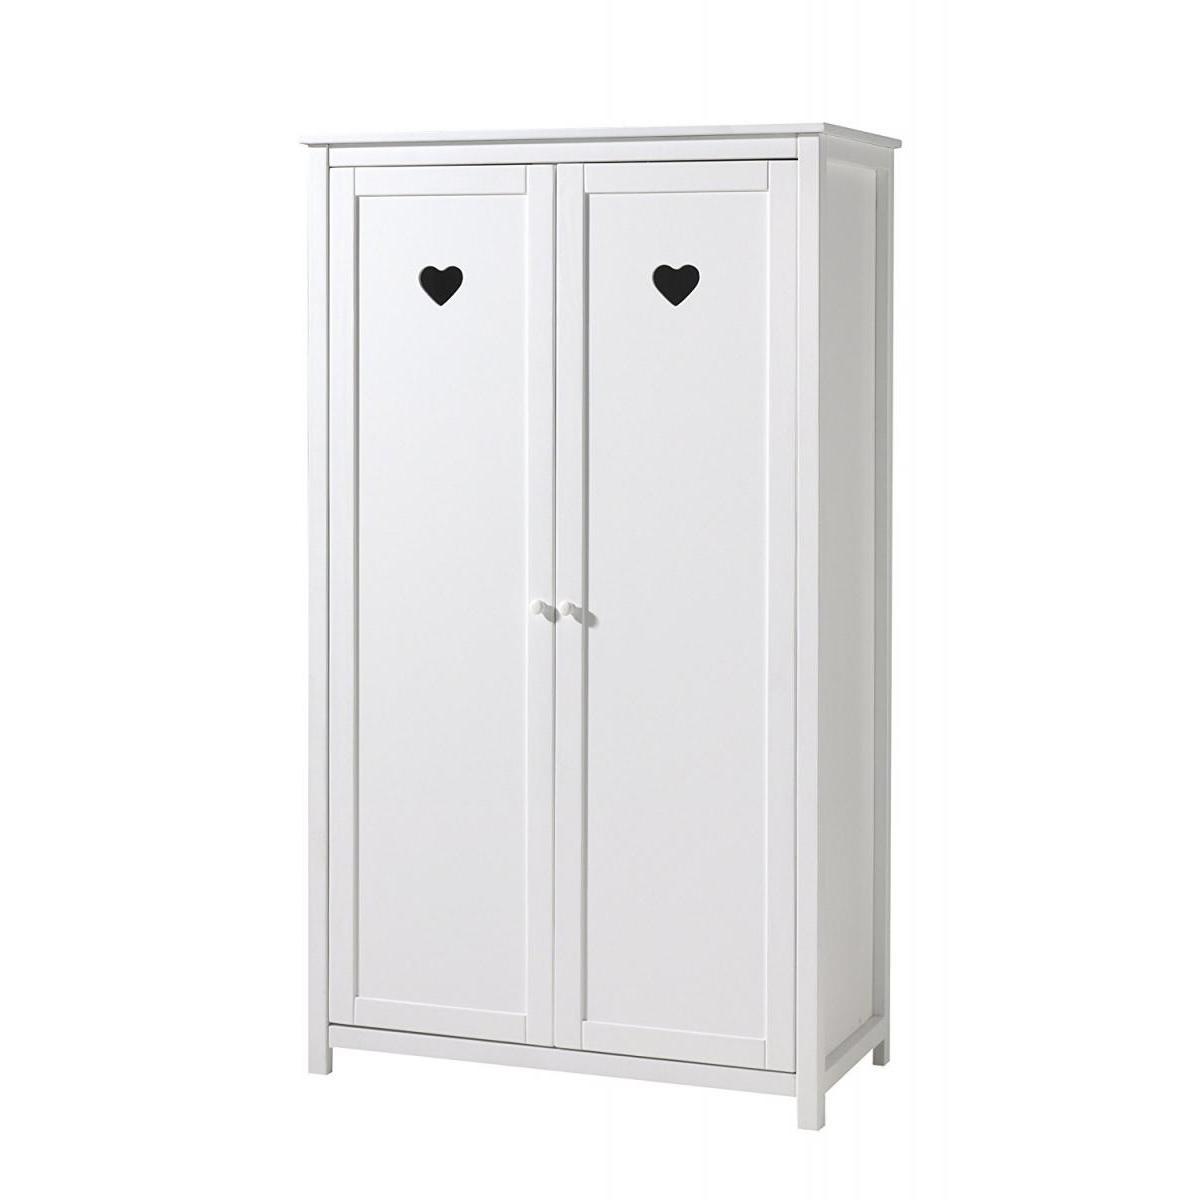 Vipack Vipack AMORI Armoire 2 portes laqué blanc